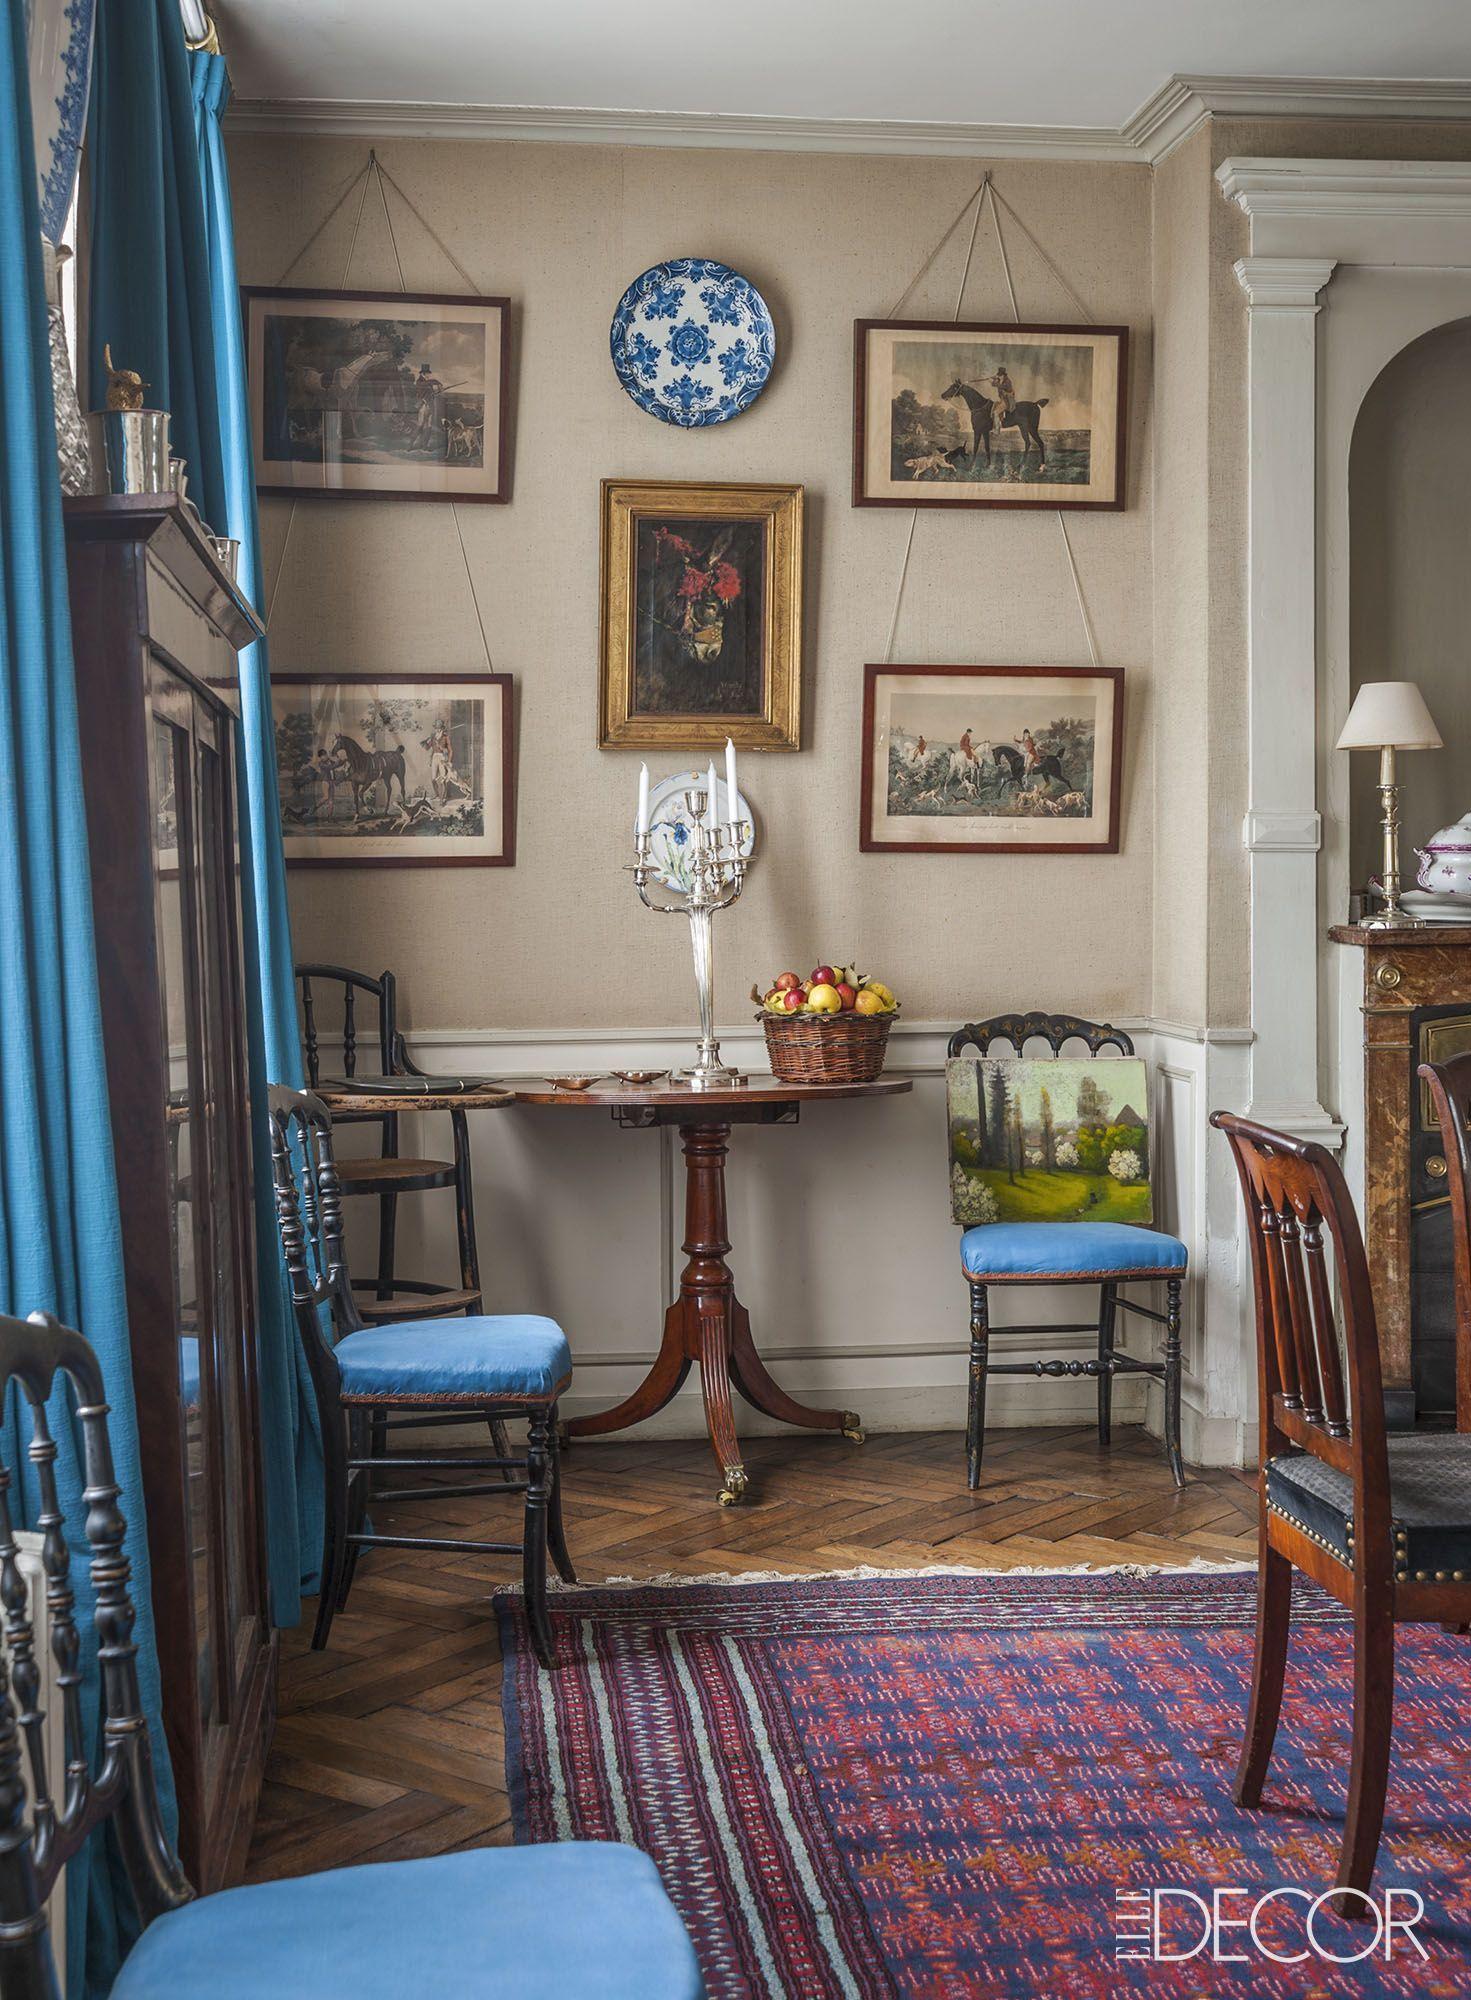 50 Perfect Curtain Ideas For Mastering Living Room Elegance English Decor Elle Decor Home Decor